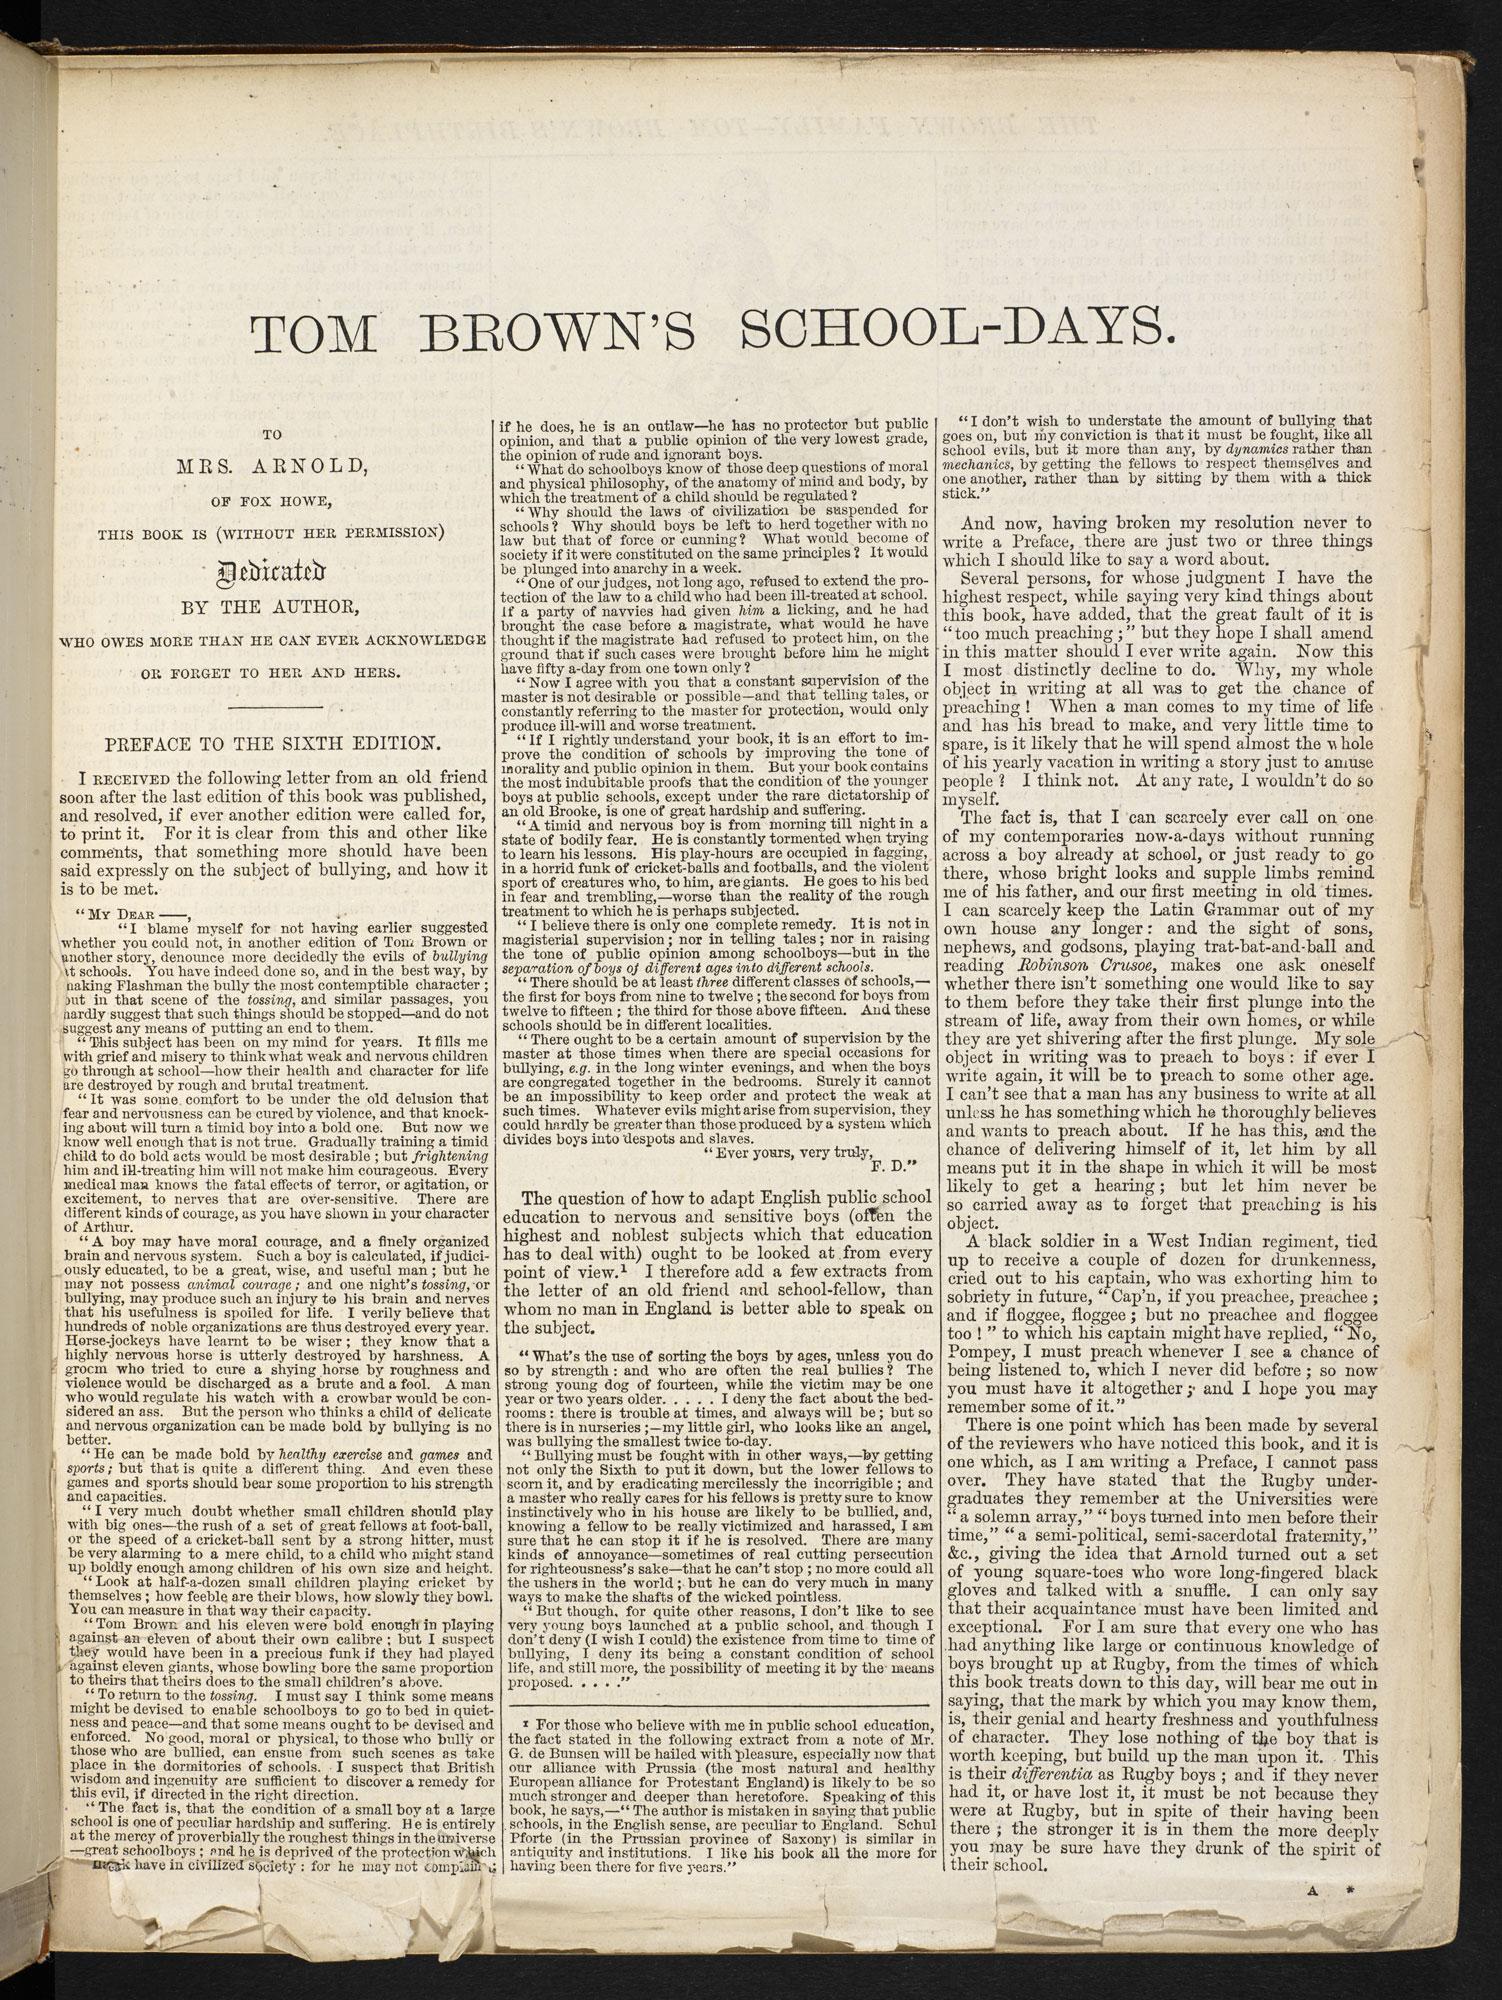 Tom Brown's Schooldays [page: 1]